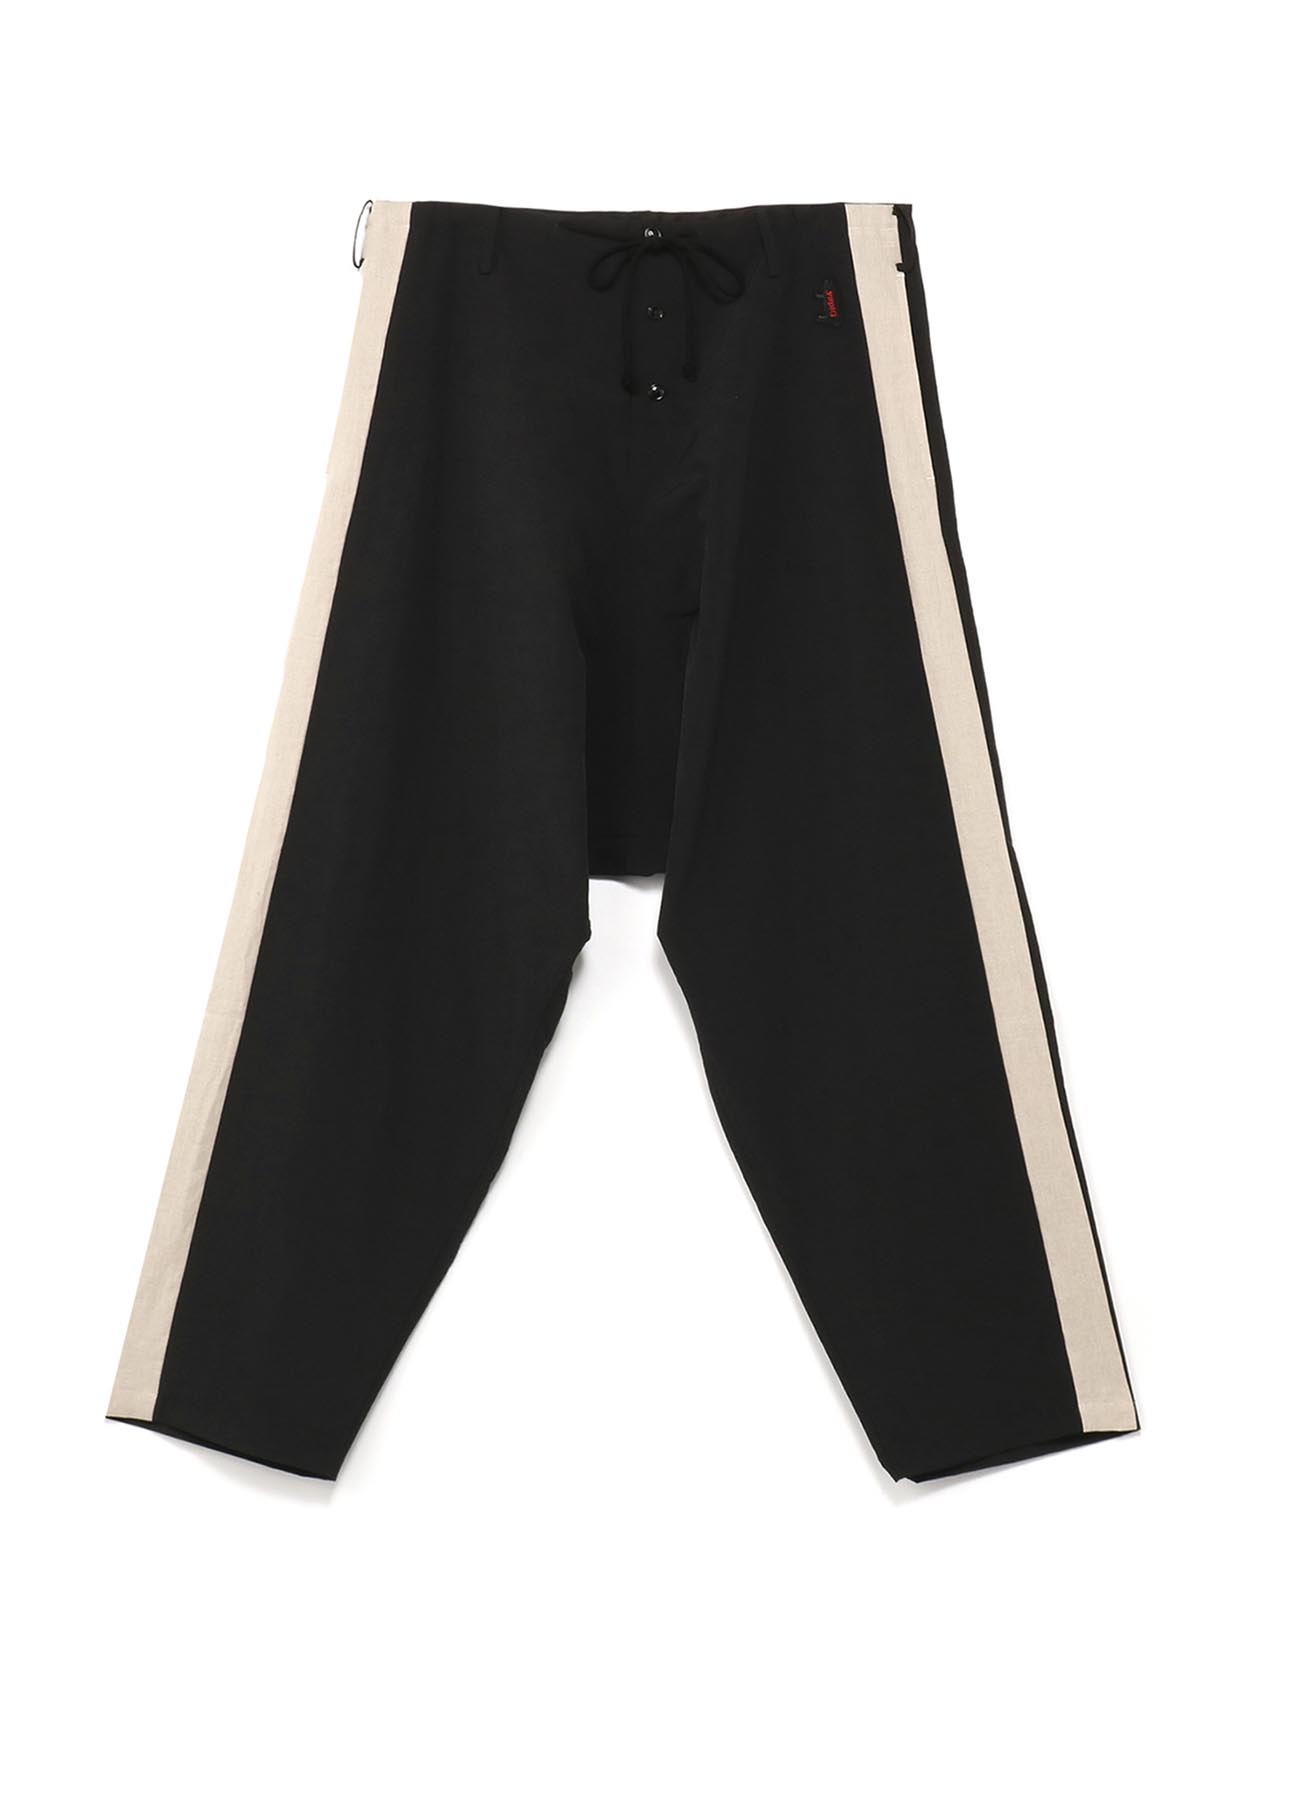 Gipsy 抽绳条纹裤线哈伦裤